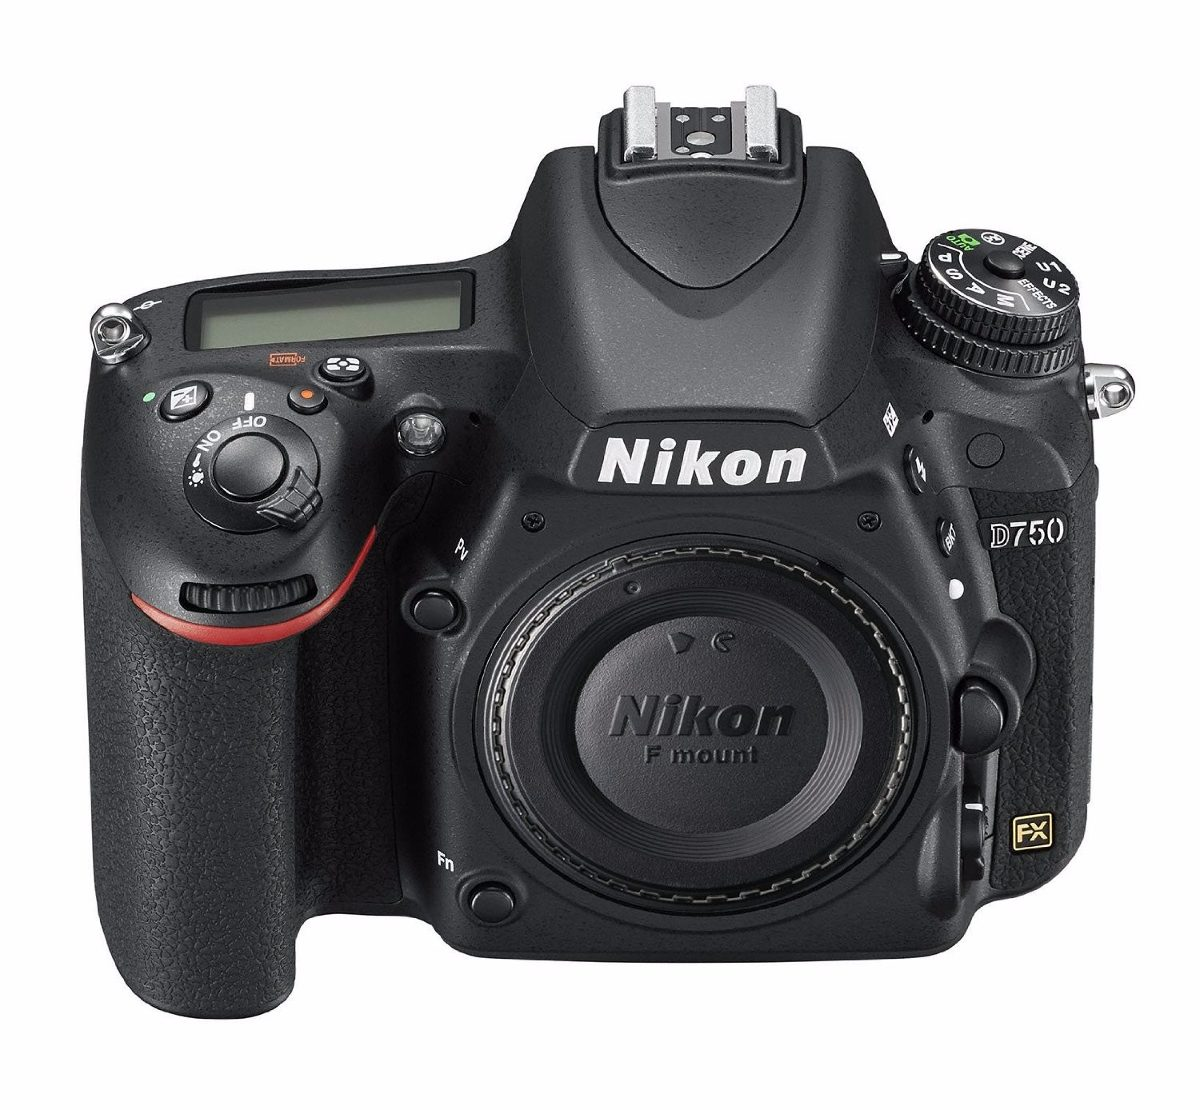 Cámara Nikon D750 Cuerpo 24.3 Mp Fx Wifi Full Frame Reflex ...